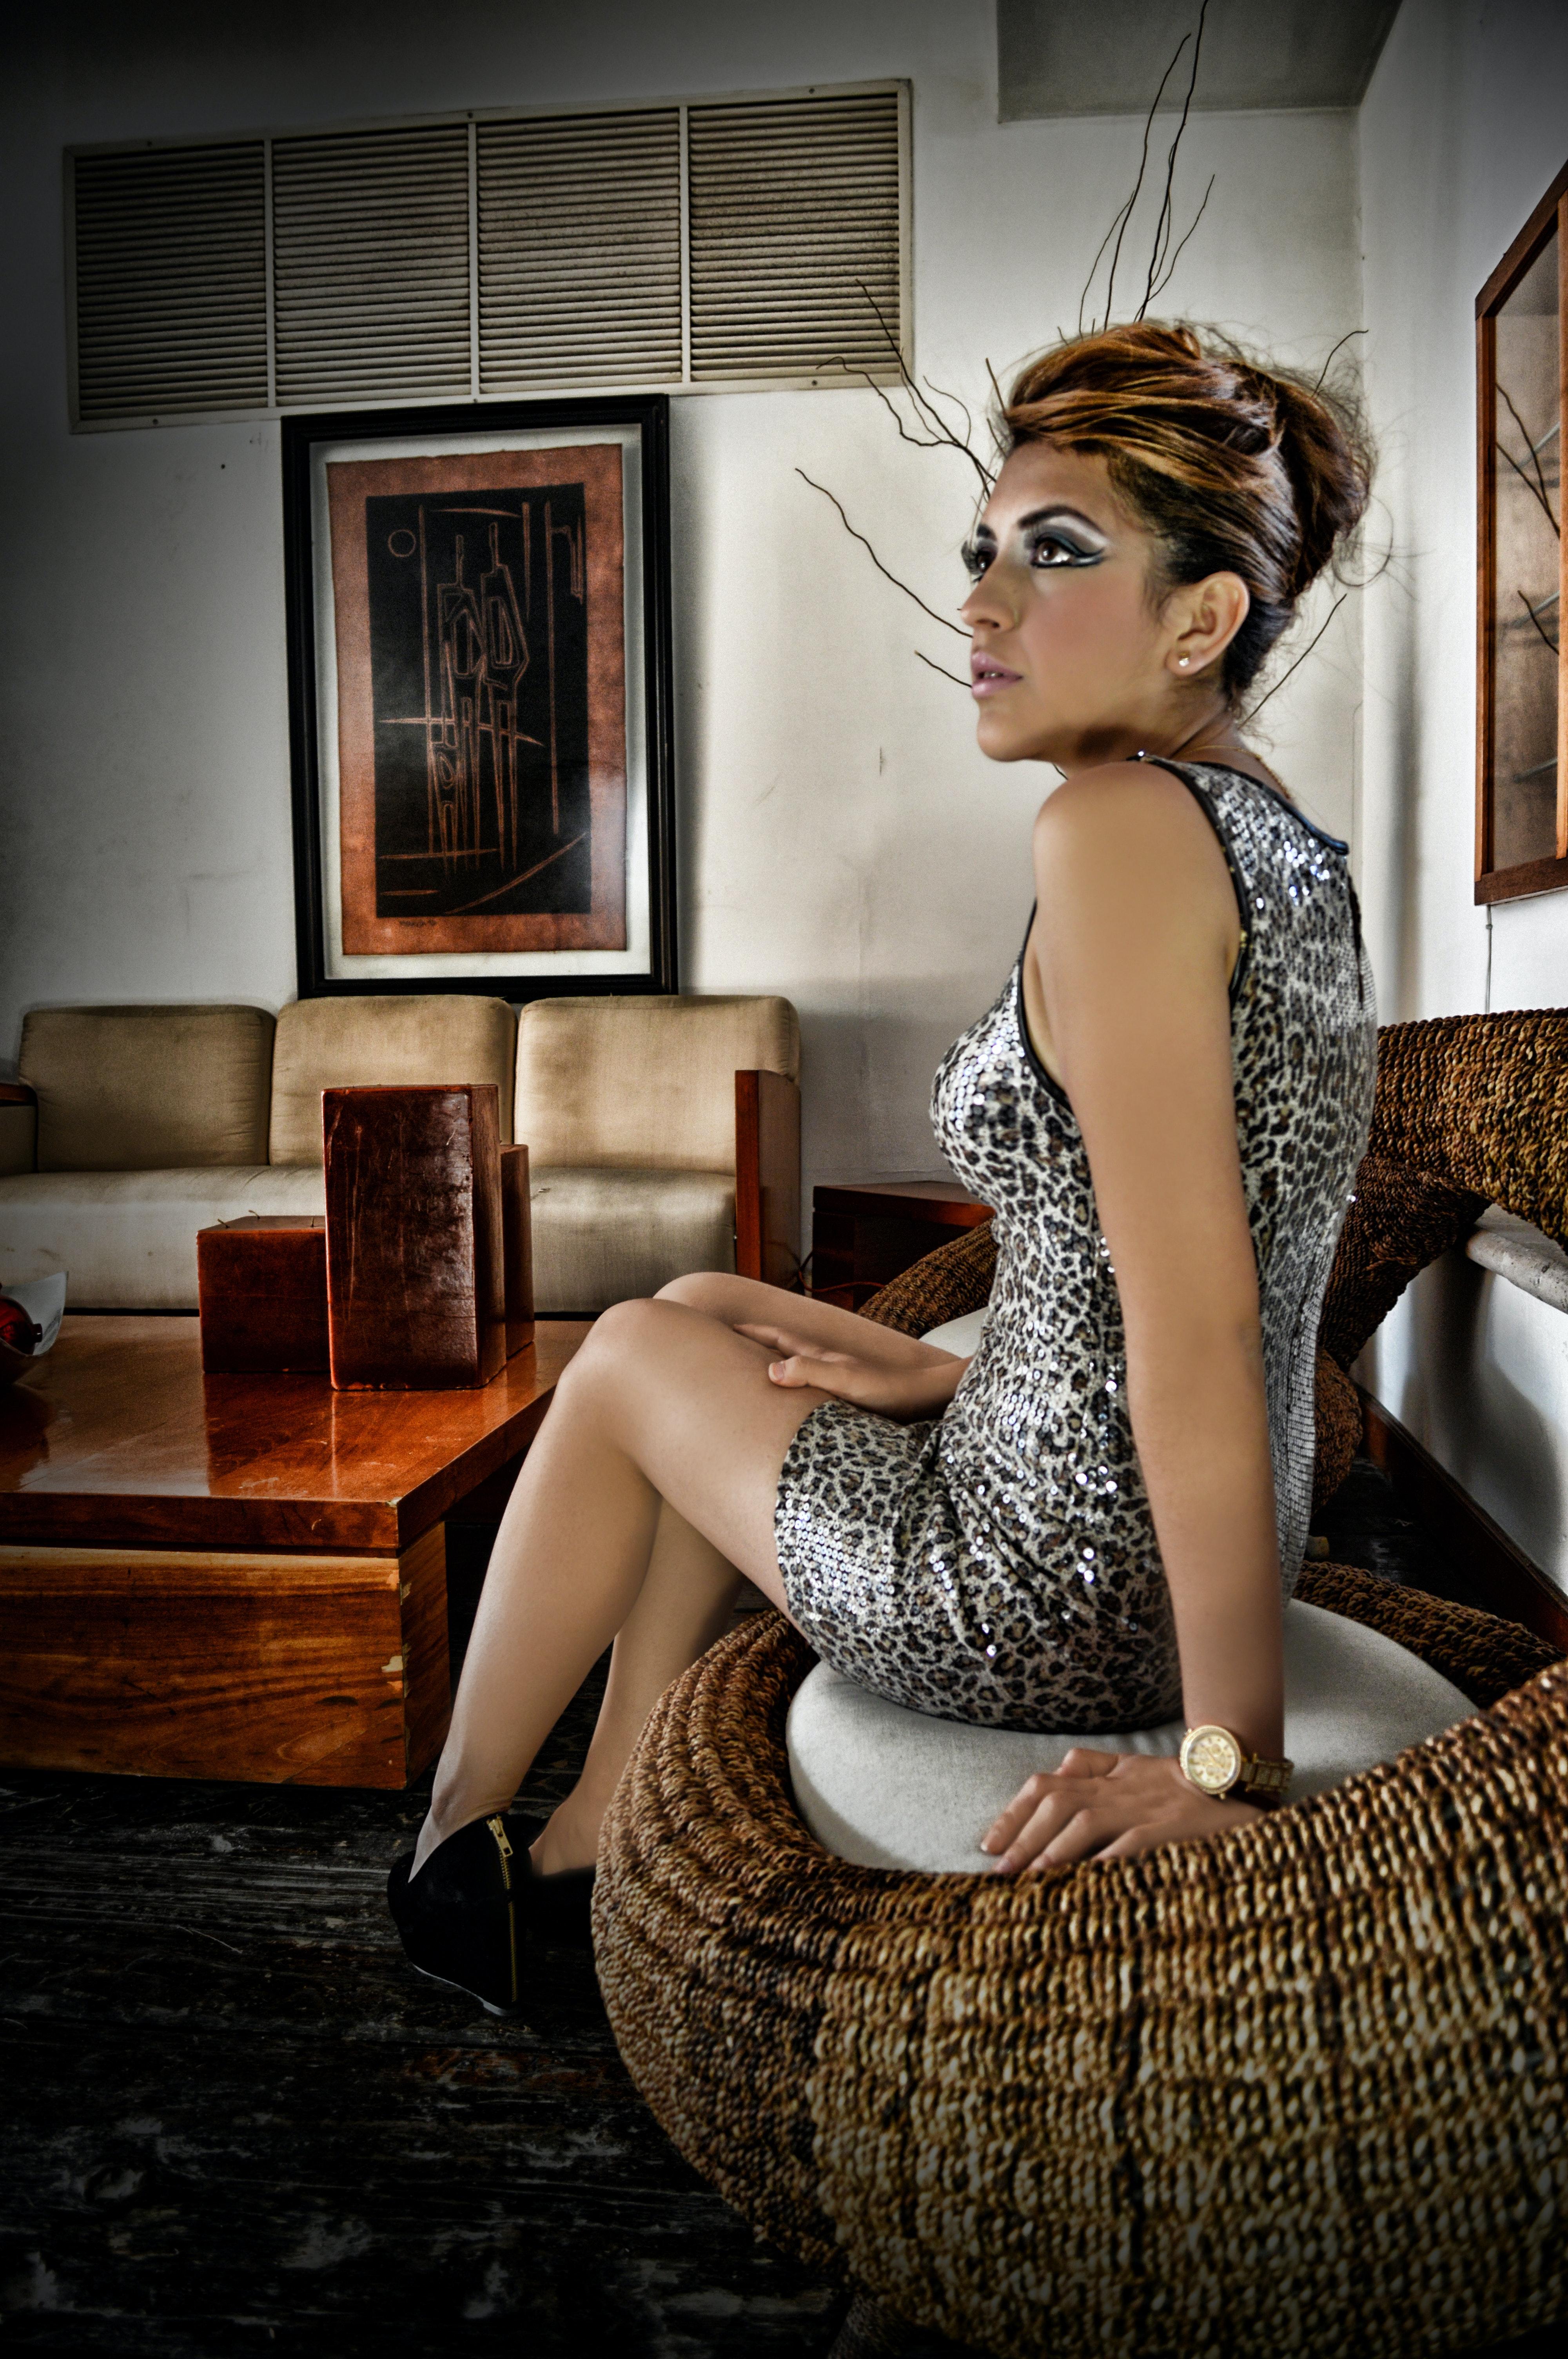 47d5c78c2ef5 Woman Wearing Leopard Print Sleeveless Mini Dress Sitting on Wicker ...